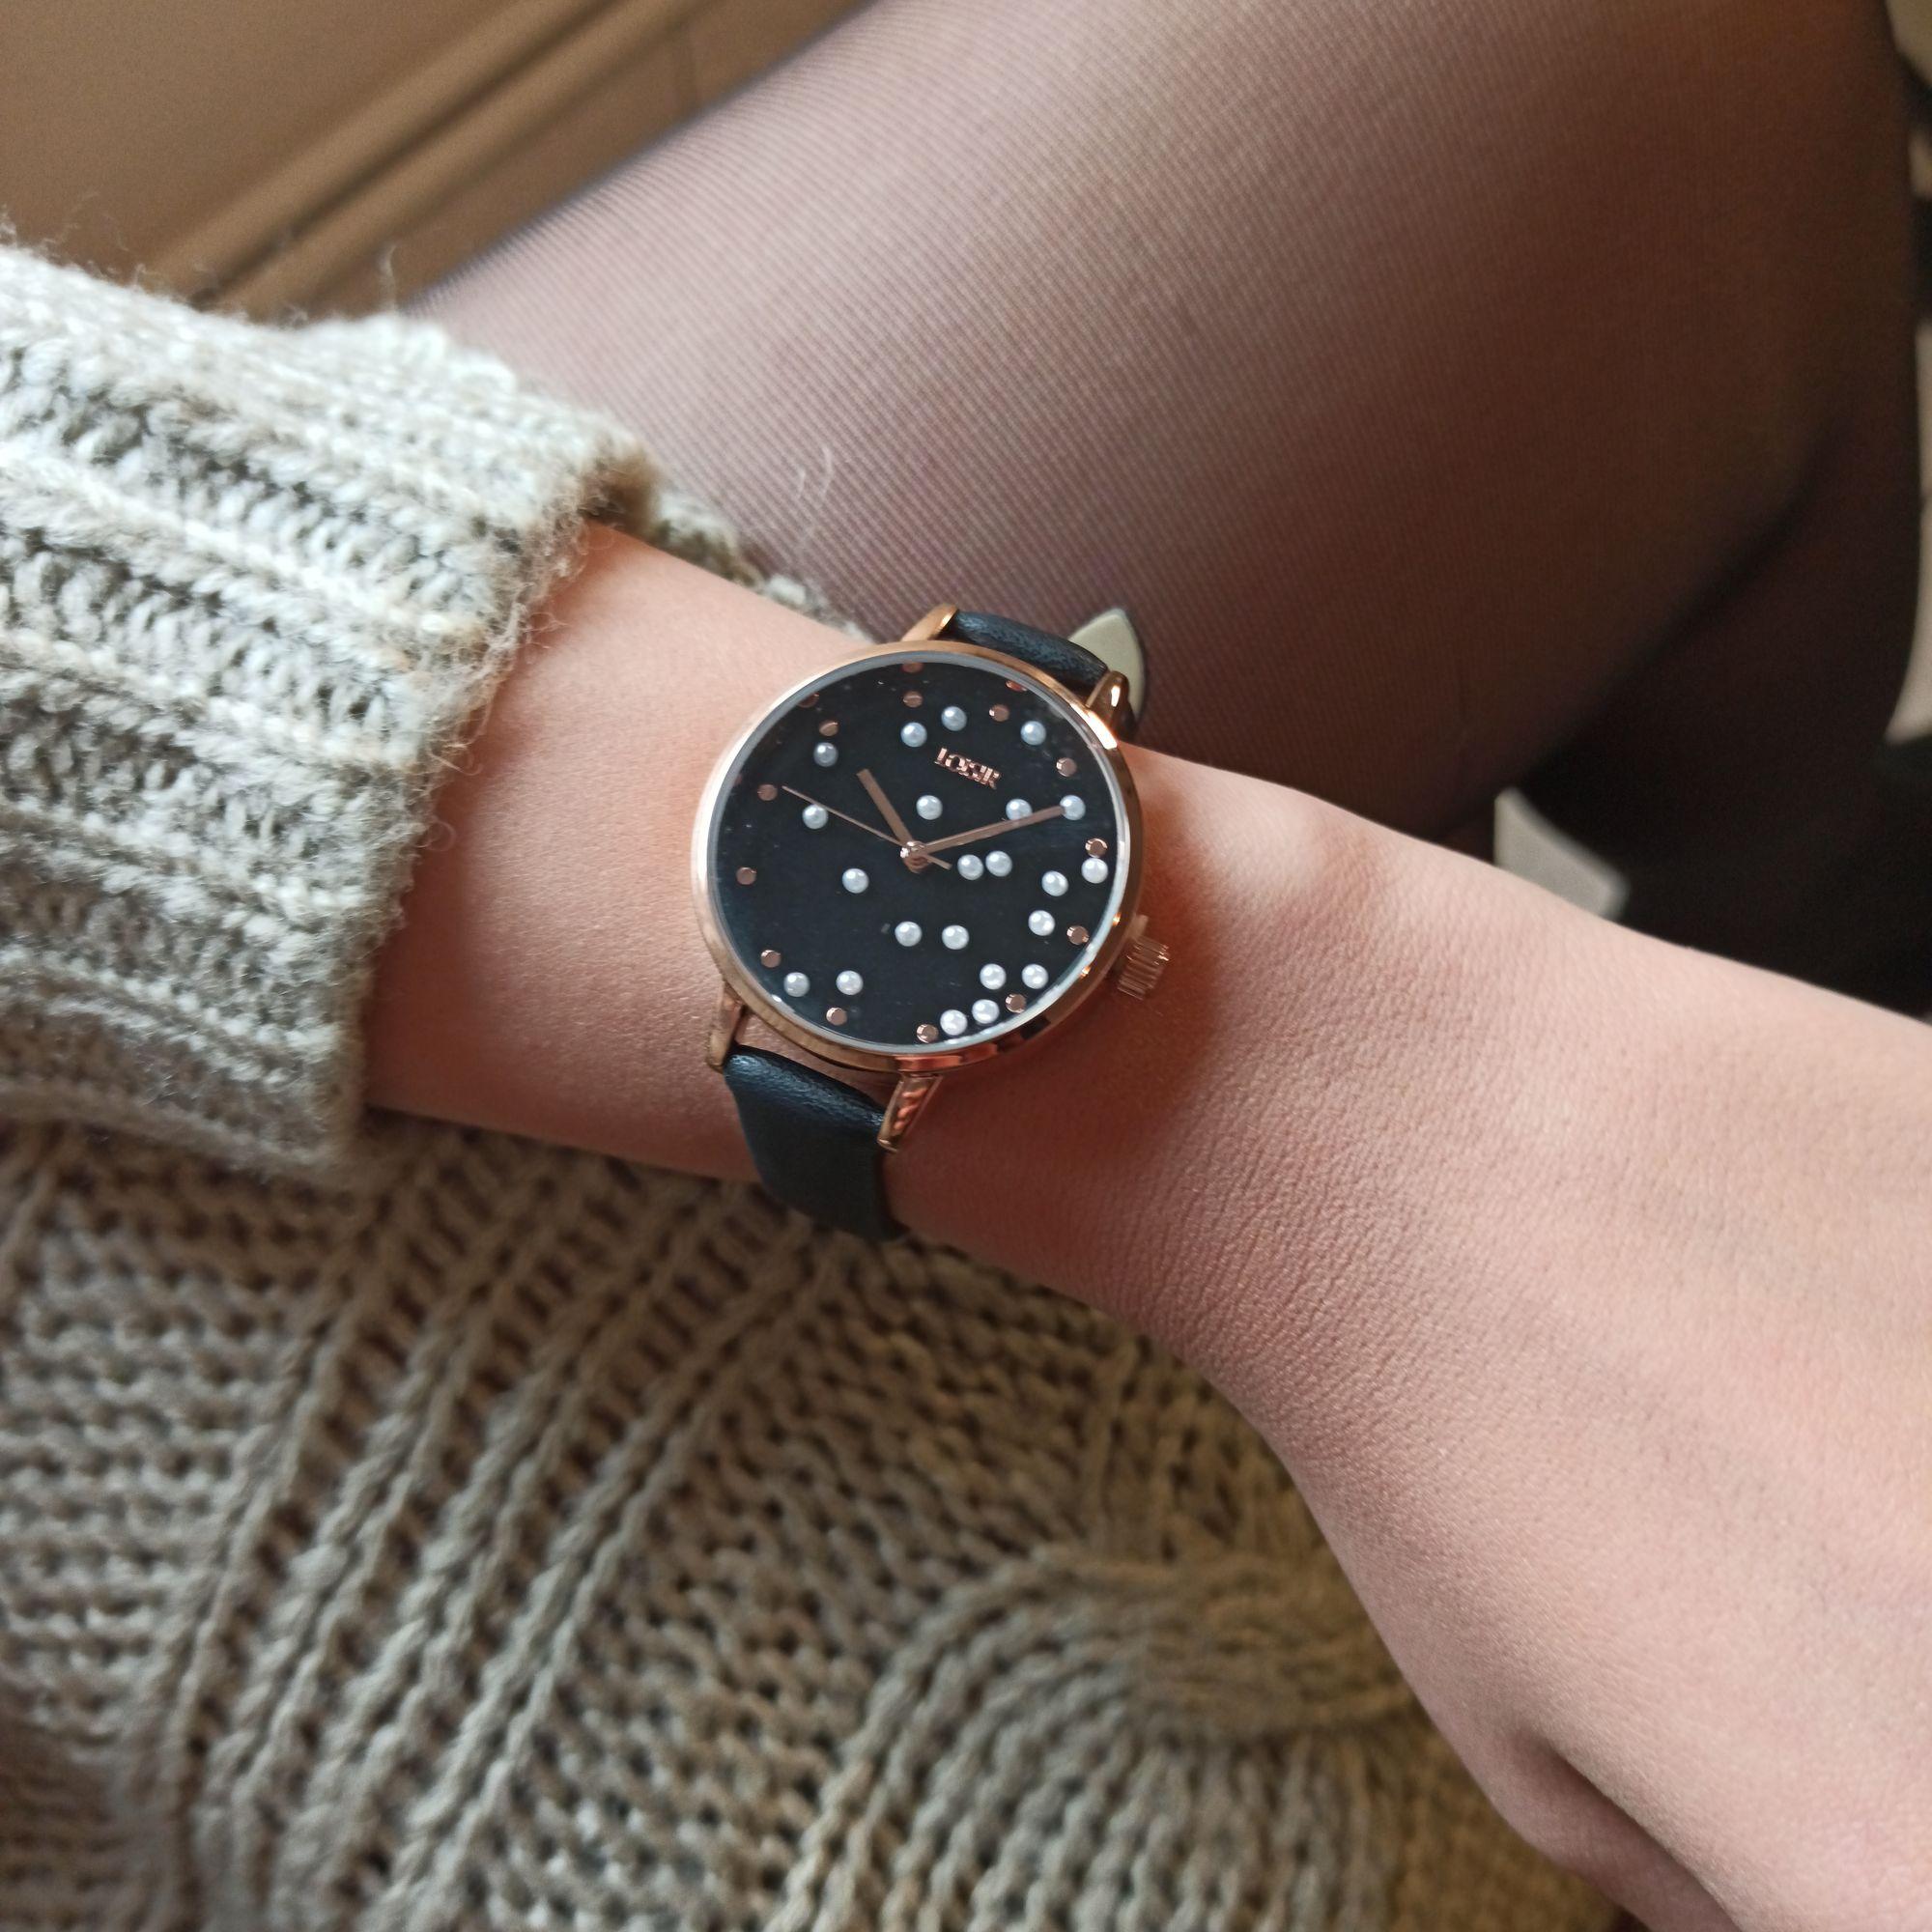 Loisir, Ρολόγια Loisir, Γυναικέια ρολόγια Loisir, δωρεάν τα έξοδα αποστολής, Loisir Dazzling